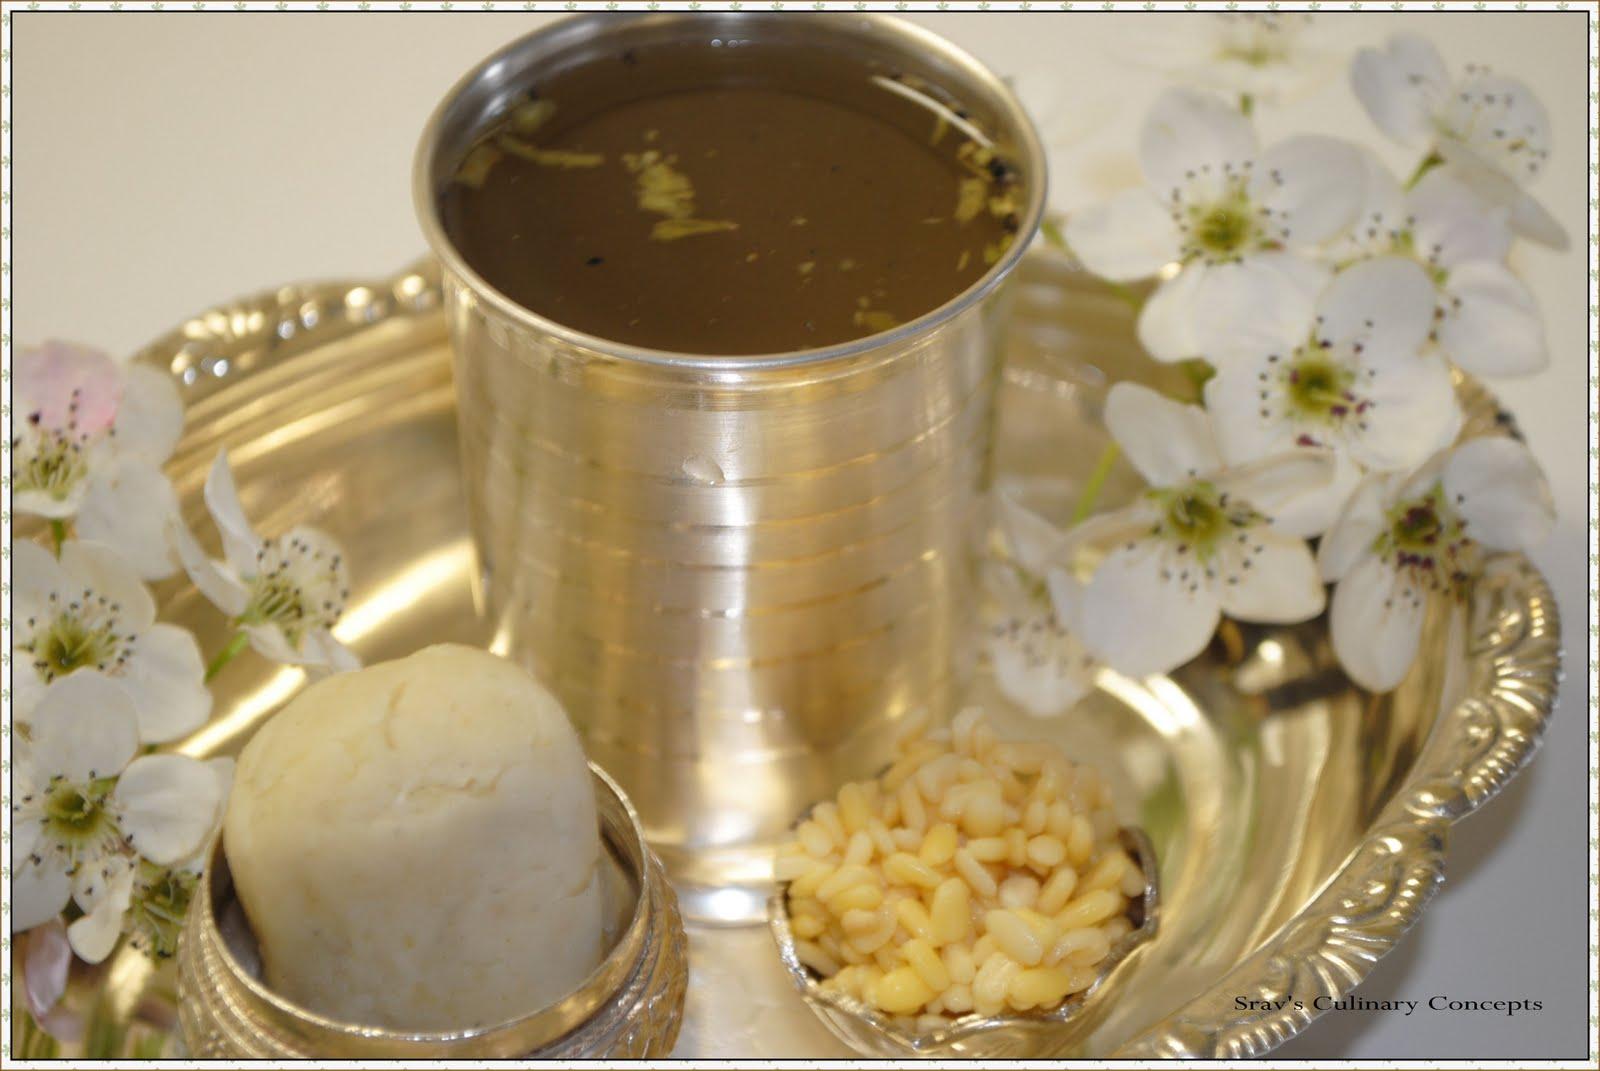 Sravs culinary concepts panakam vadapappu chalimidi sri rama ingredients forumfinder Gallery